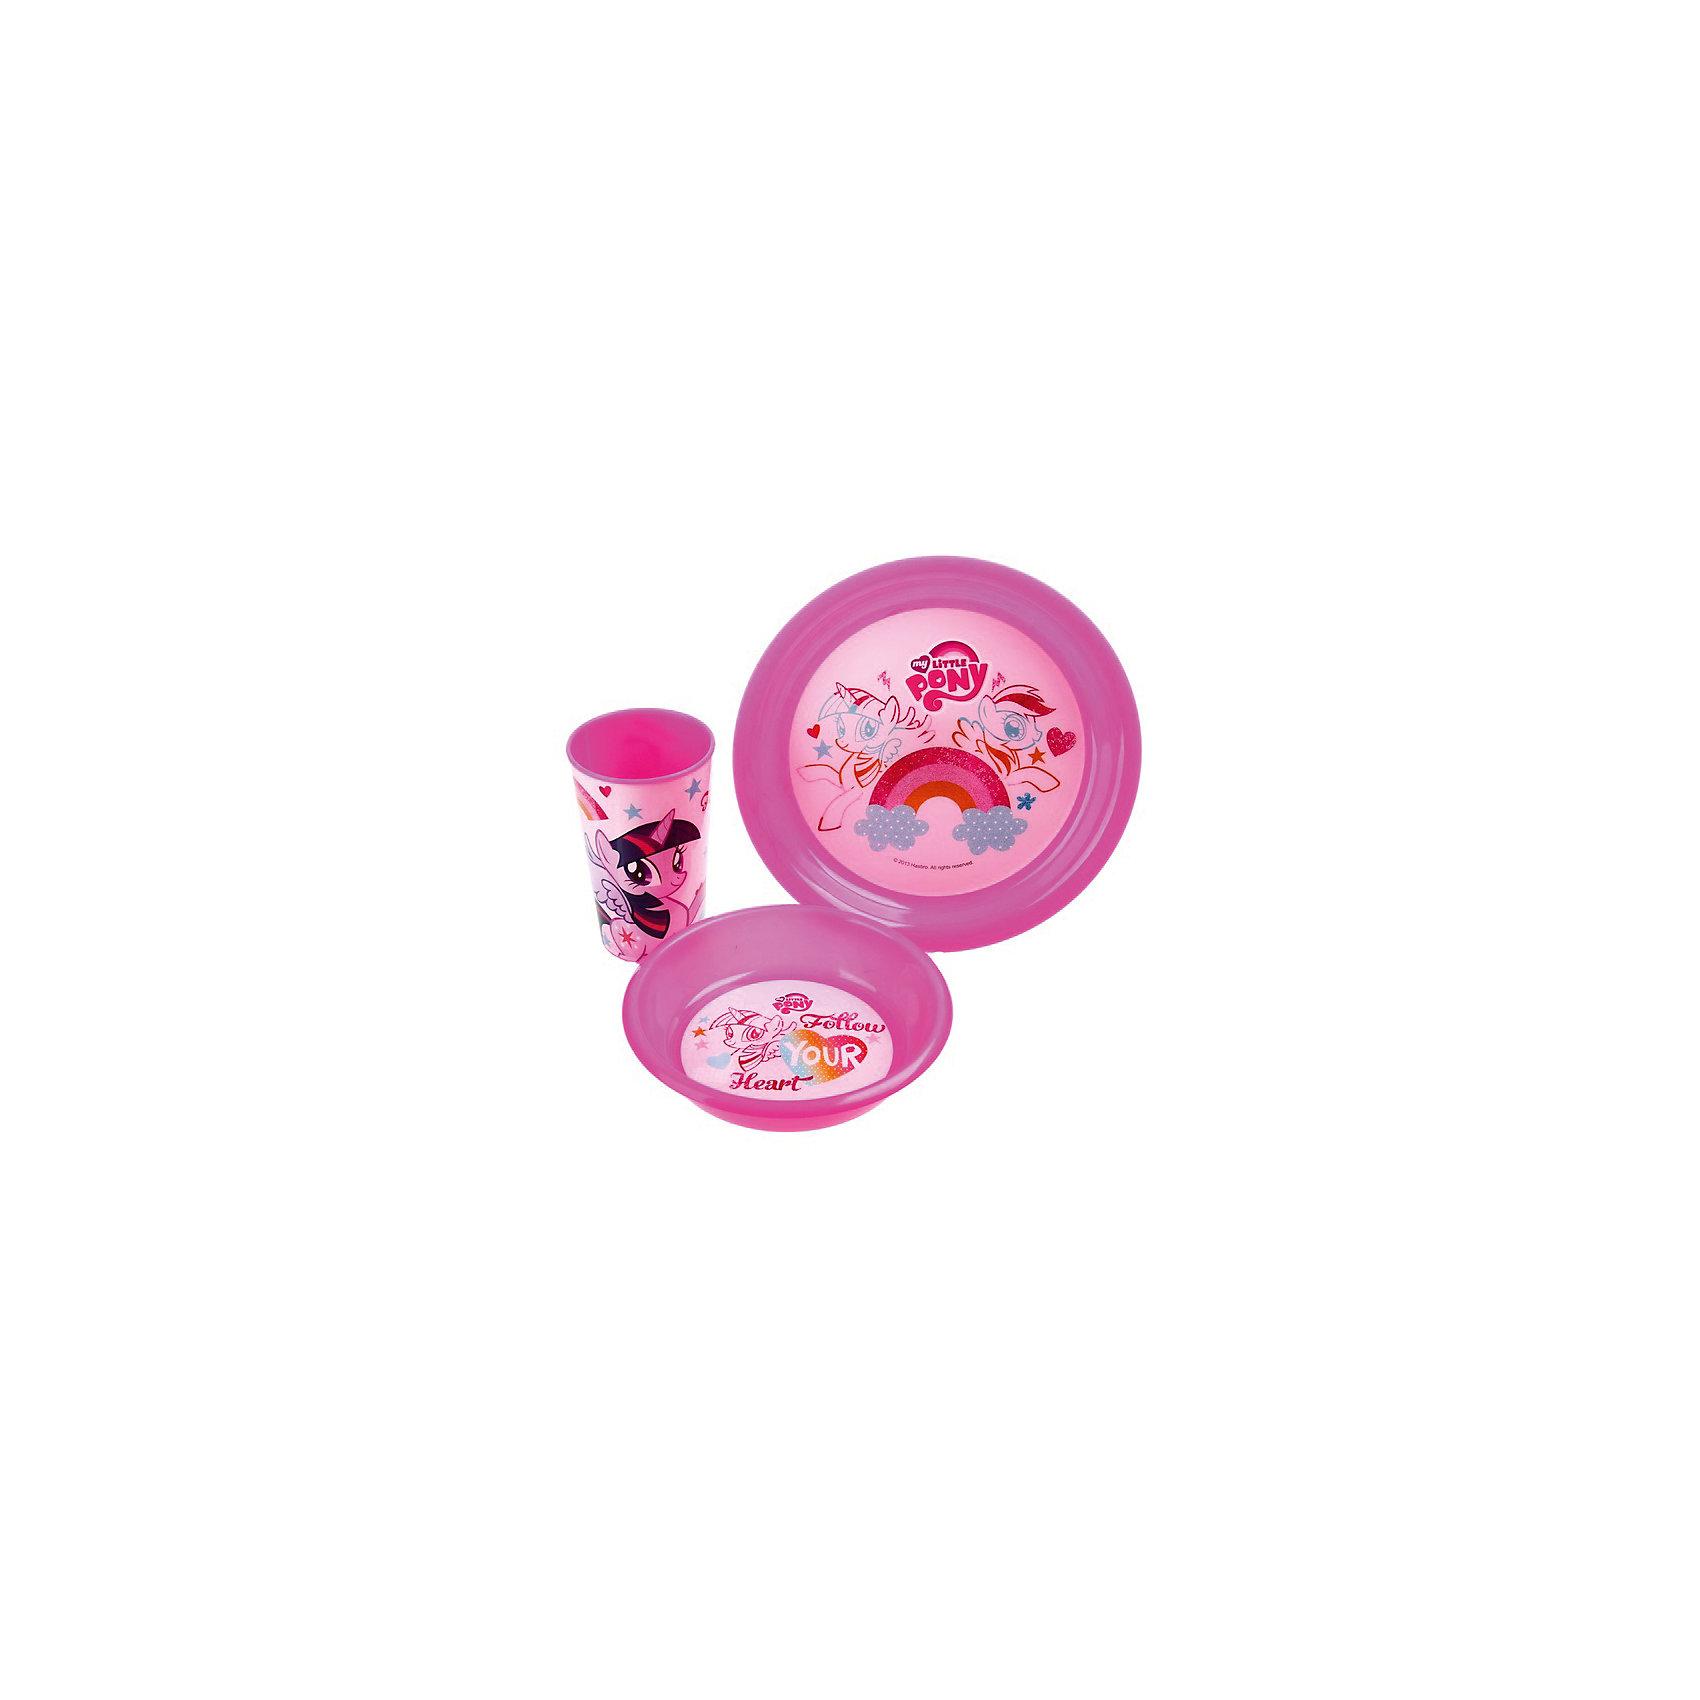 Розовый набор посуды (3 предмета), My little Pony